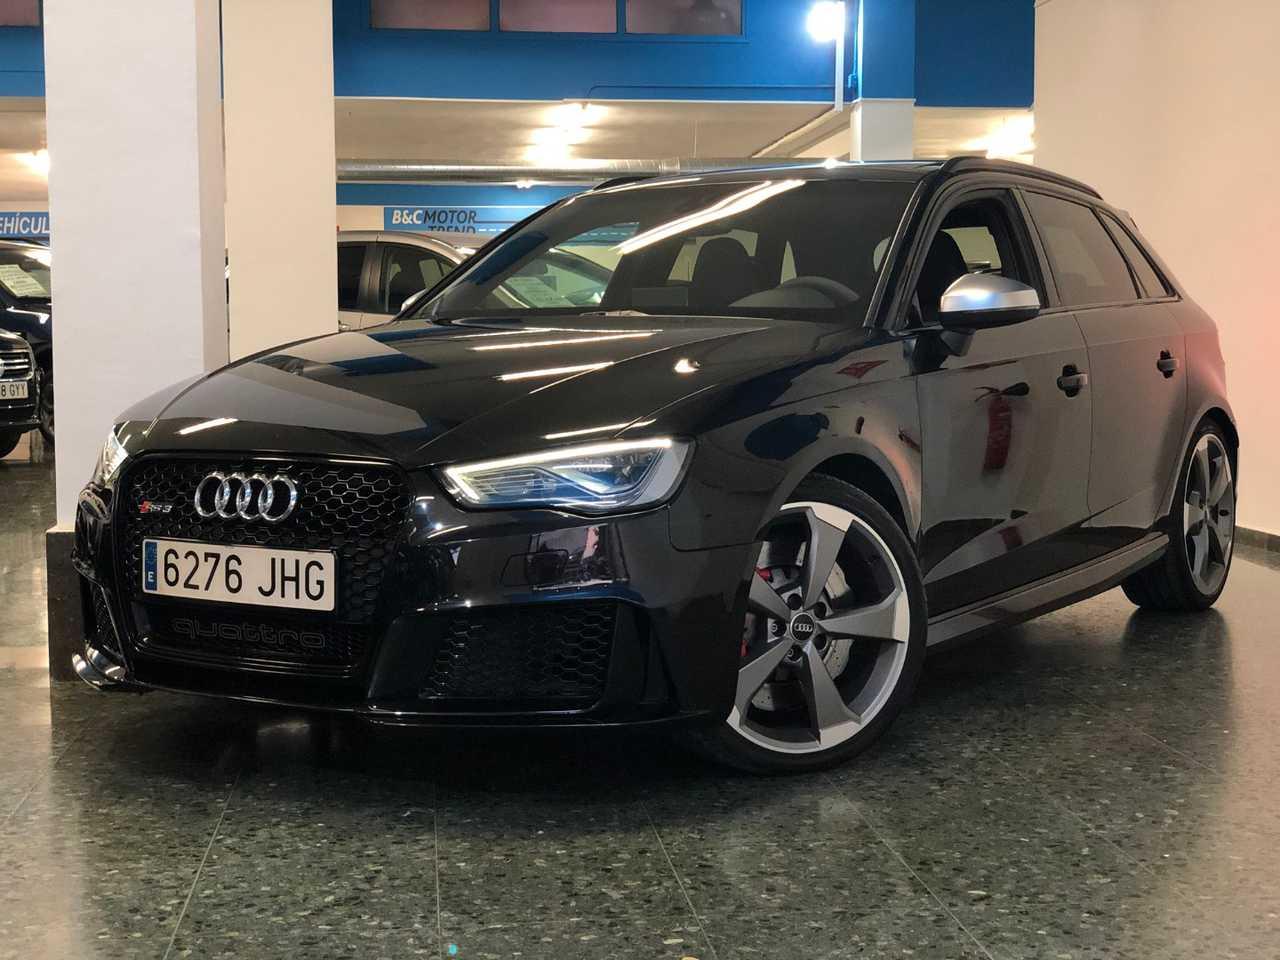 Audi RS3 2.5TFSI 367cv S-Tronic QUATTRO **NACIONAL - SÓLO 46.000KMS**   - Foto 1